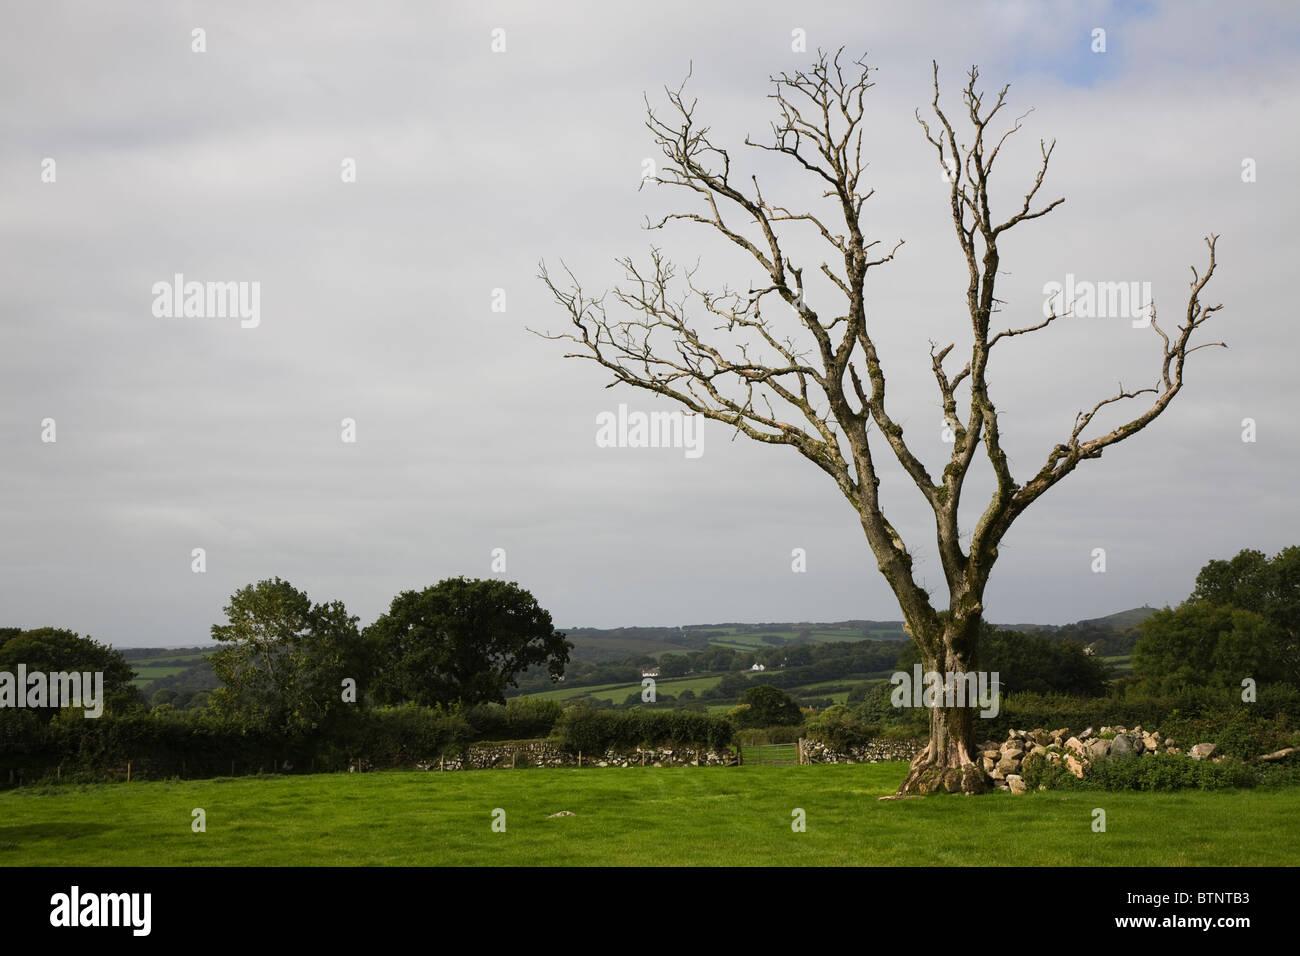 Lonesome tree on Dartmoor meadow - Stock Image